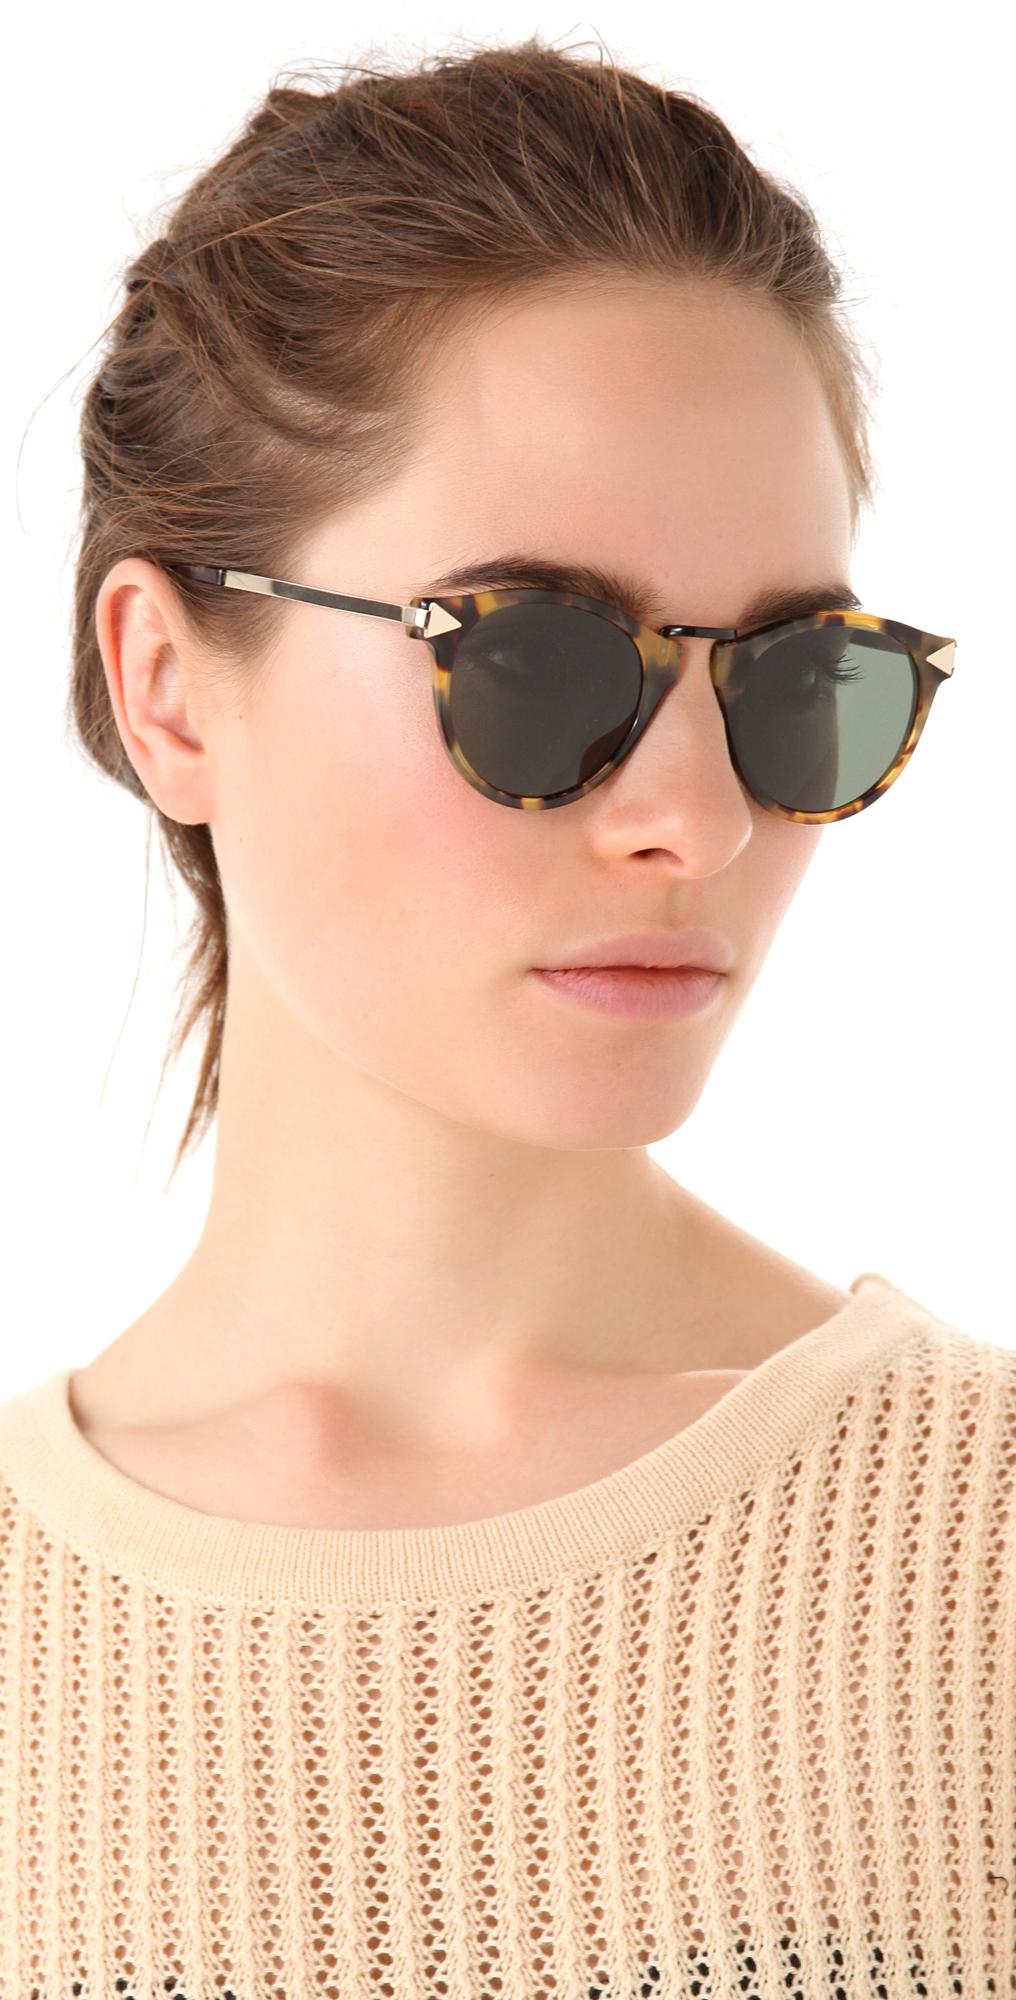 82e90b28d2d Lyst - Karen Walker Helter Skelter Sunglasses in Brown